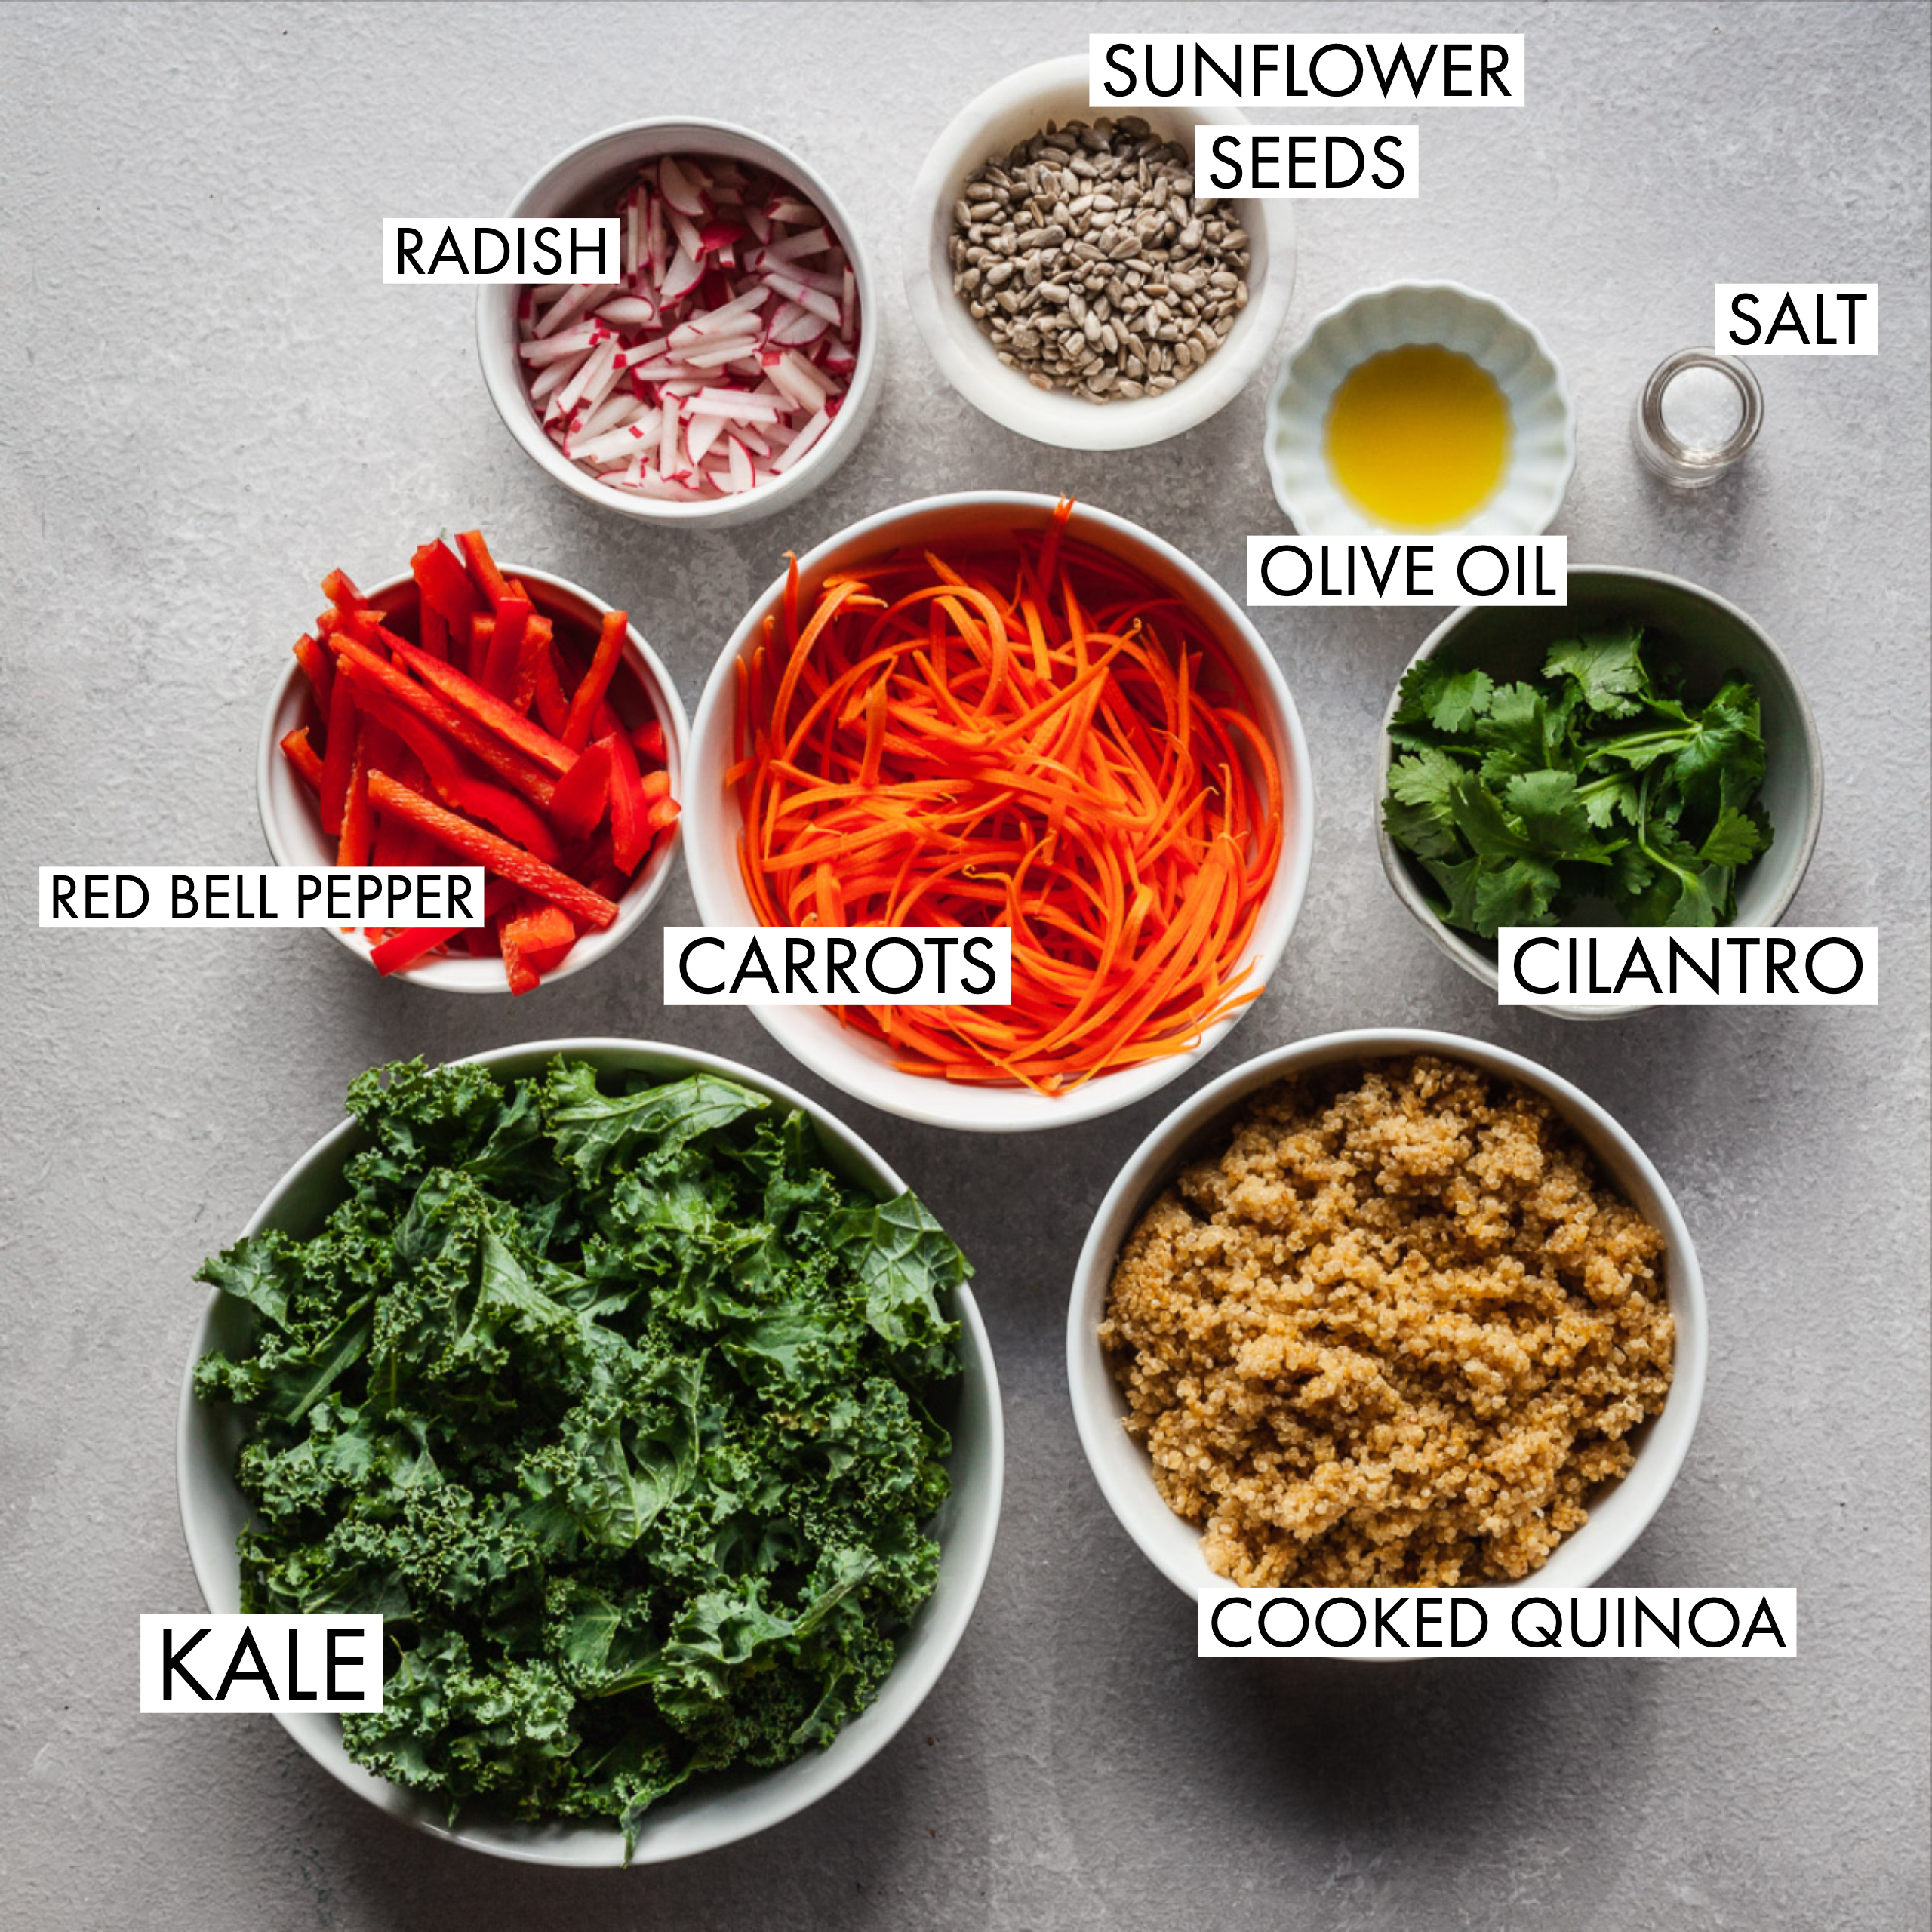 ingredients for kale quinoa salad